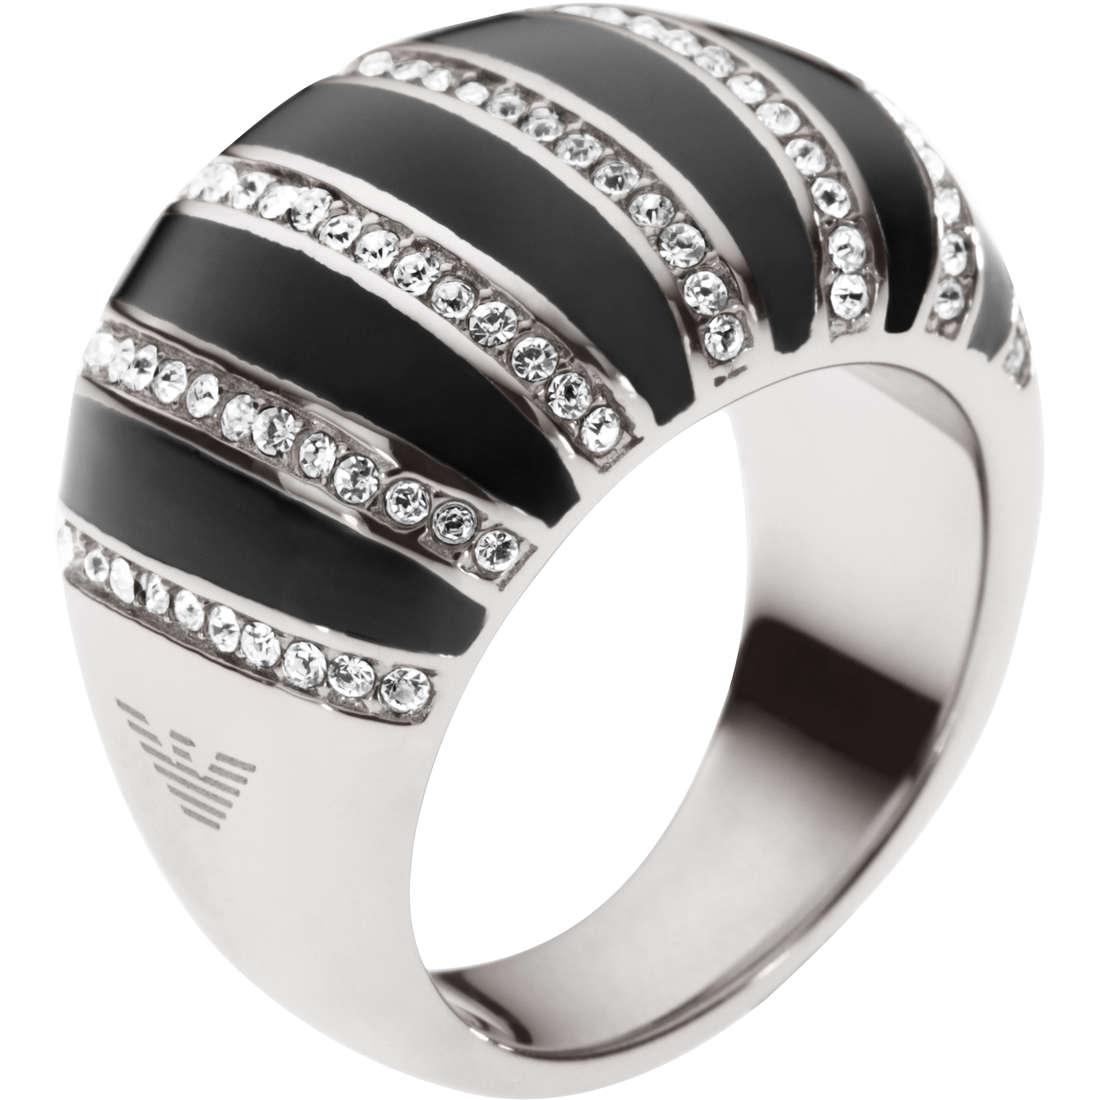 ring woman jewellery Emporio Armani EGS1676040505